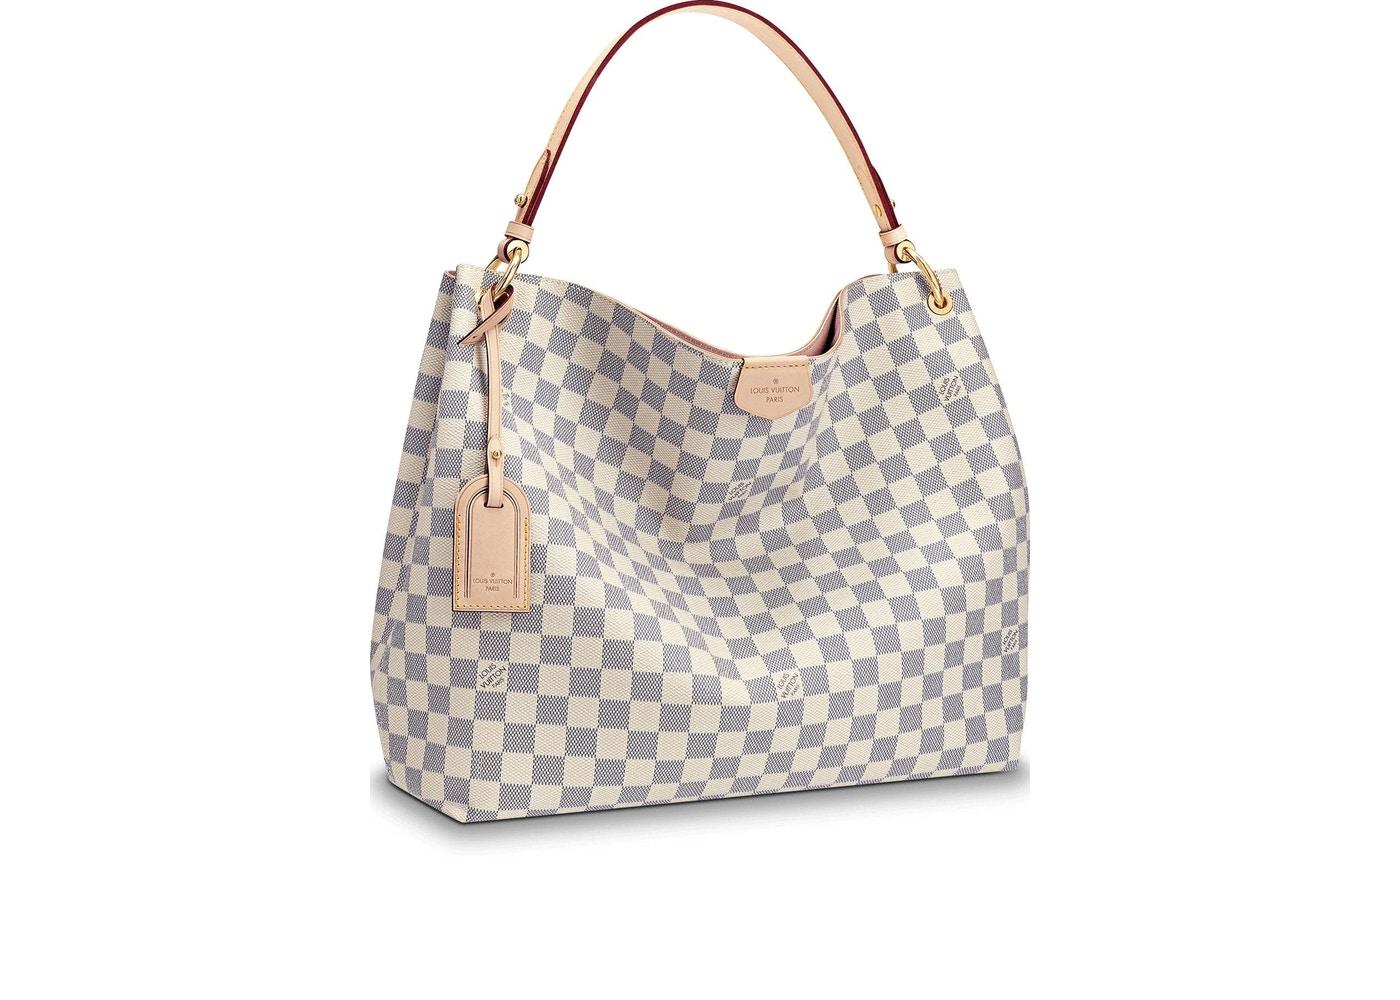 Louis Vuitton Graceful Damier Azur Mm Rose Ballerine